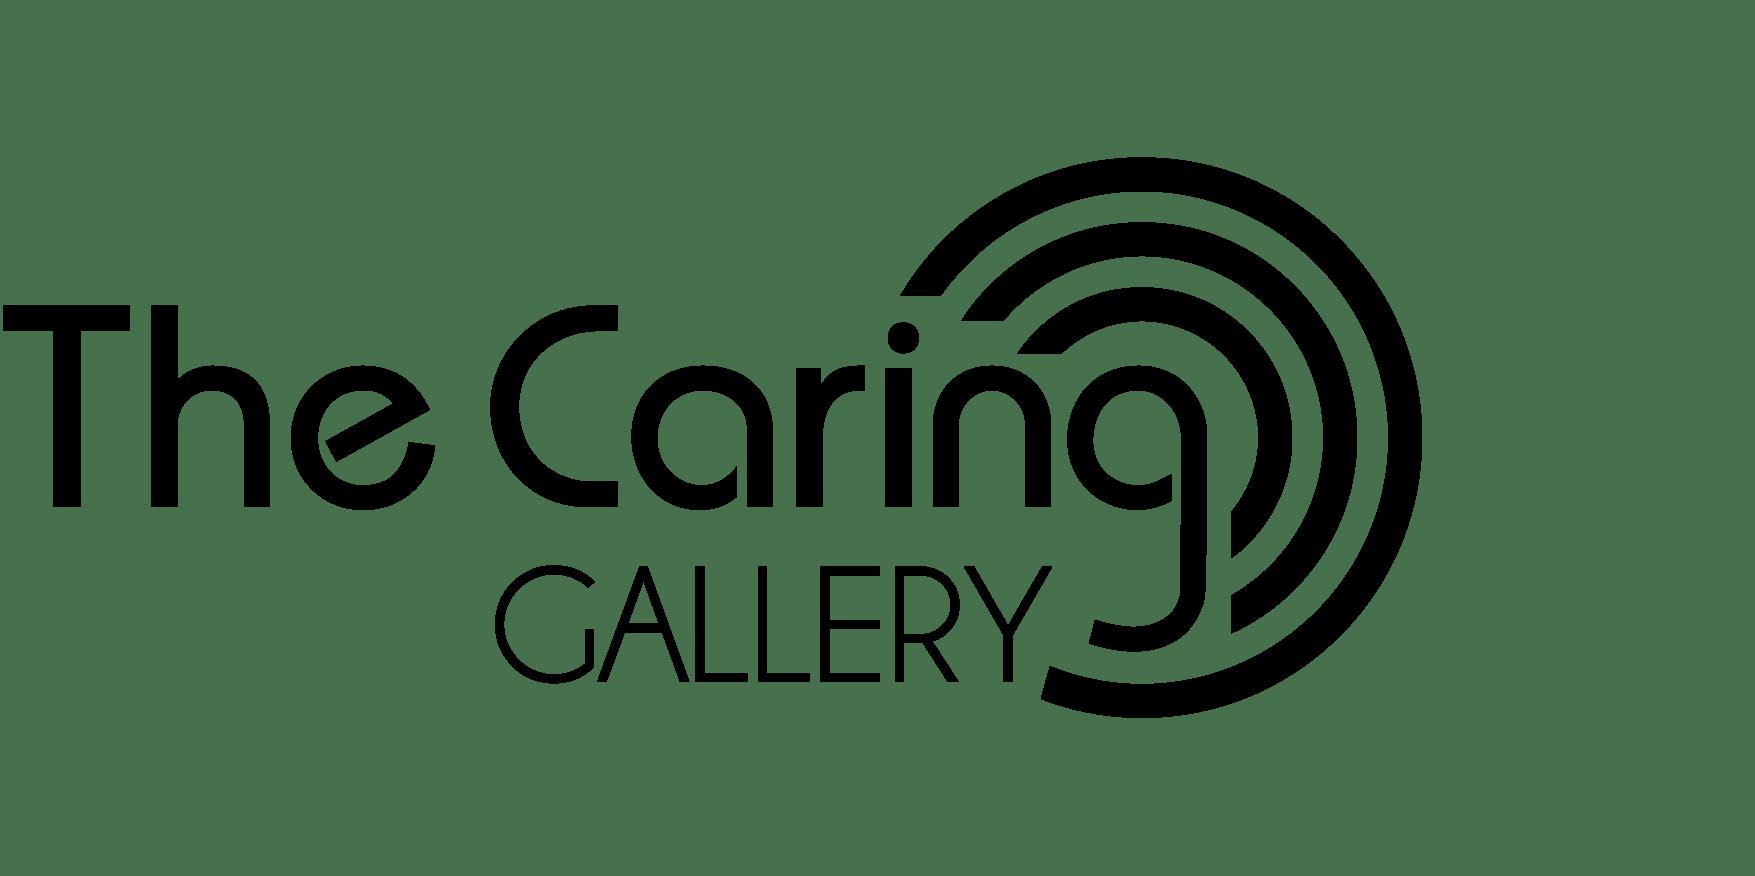 The Caring Gallery company logo